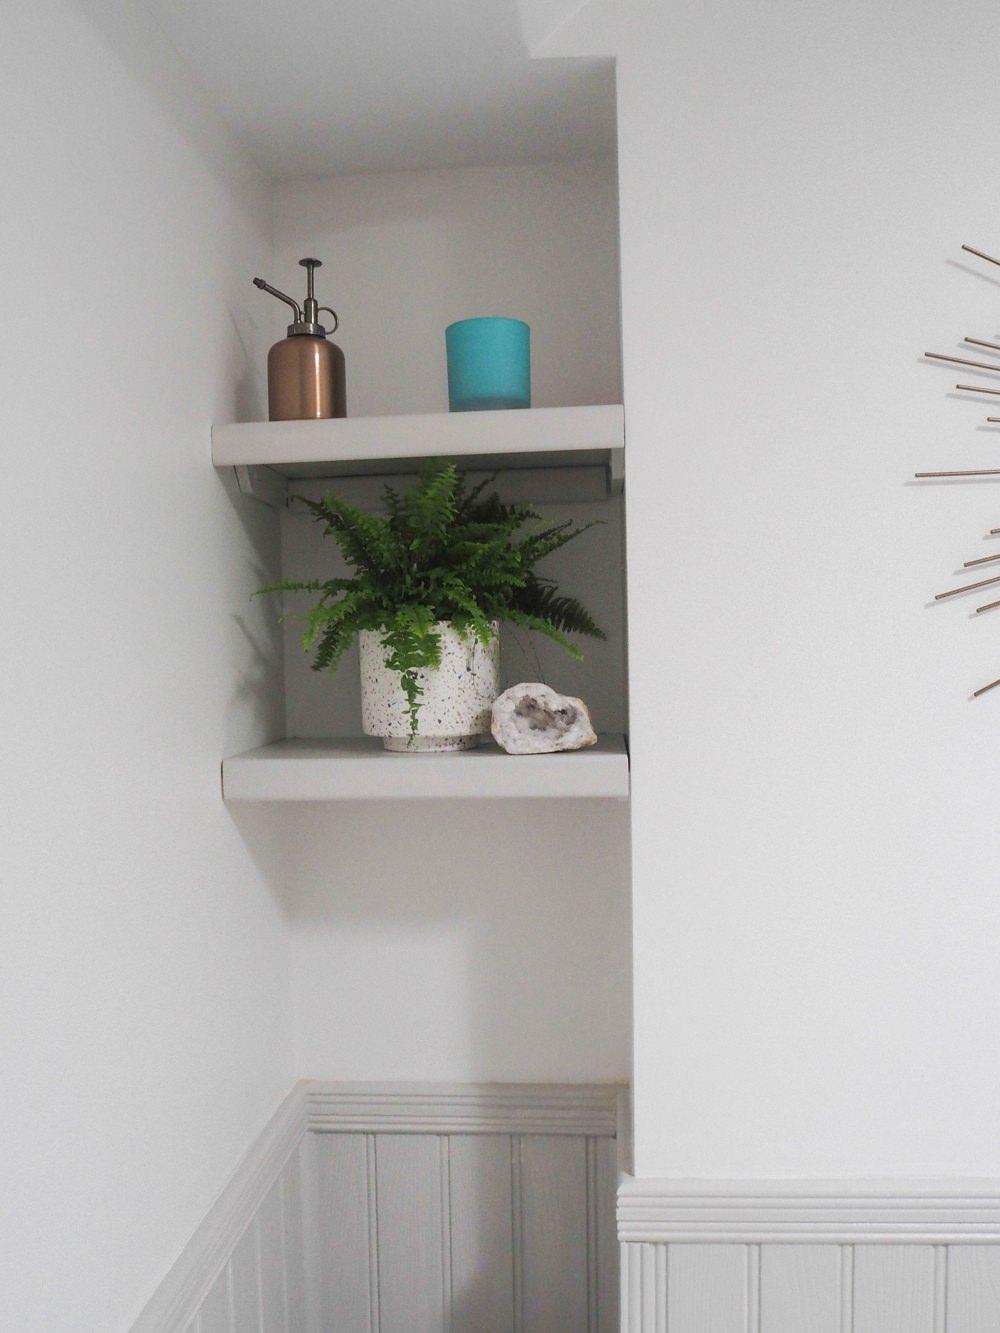 Bathroom Renovation Alcove Shelves Shelving Pot Plant Accessories